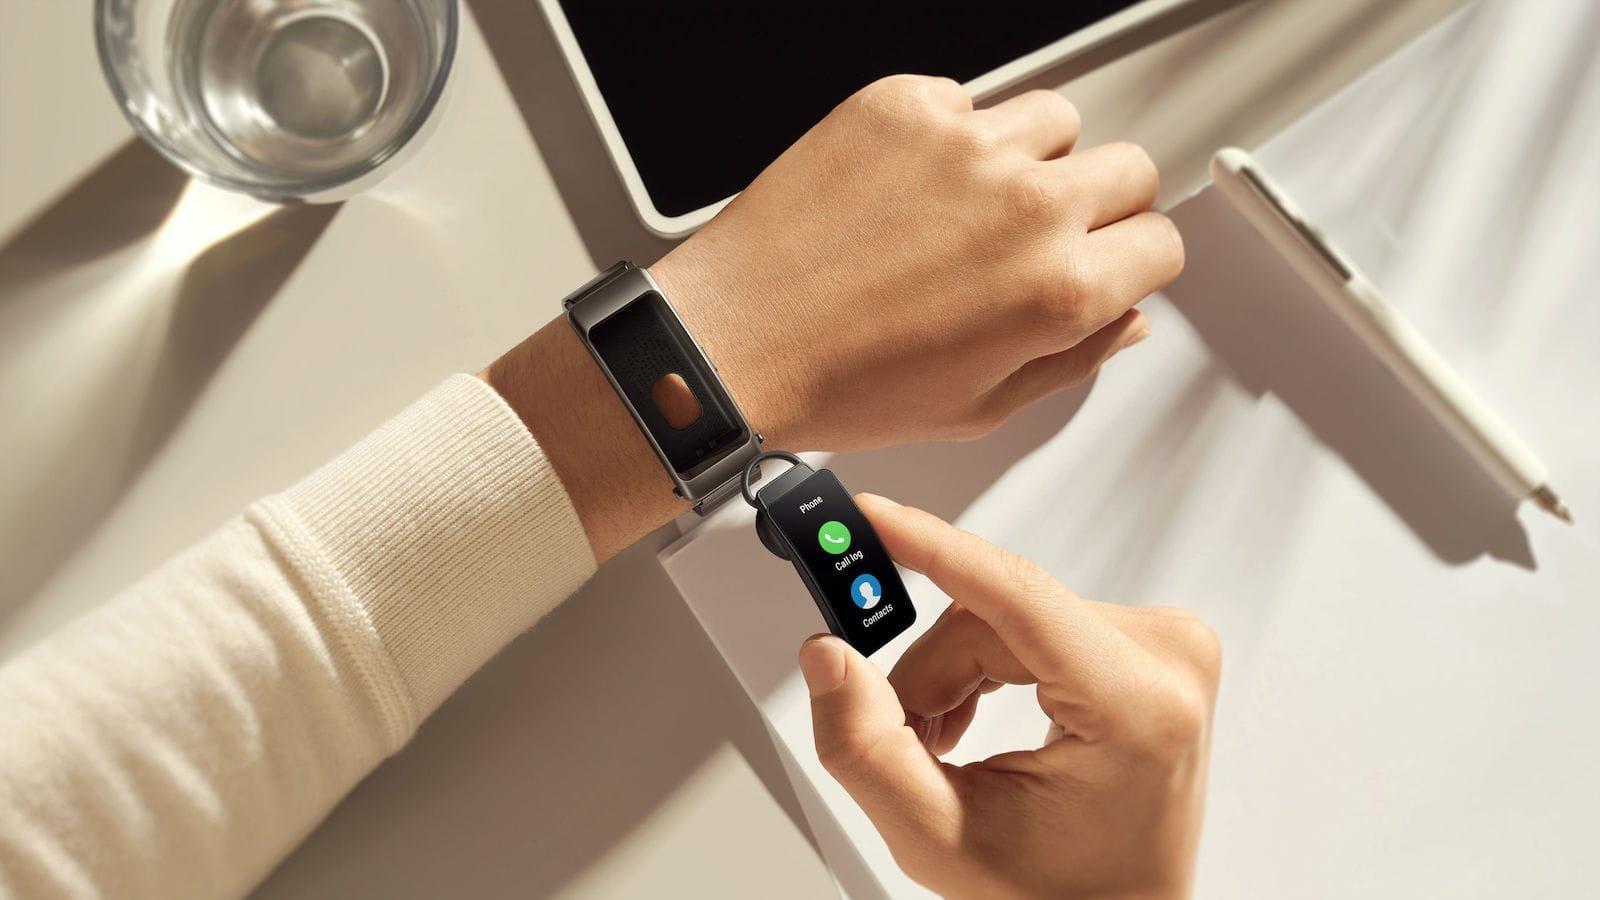 Huawei TalkBand B6 smart activity tracker features a detachable Bluetooth earphone